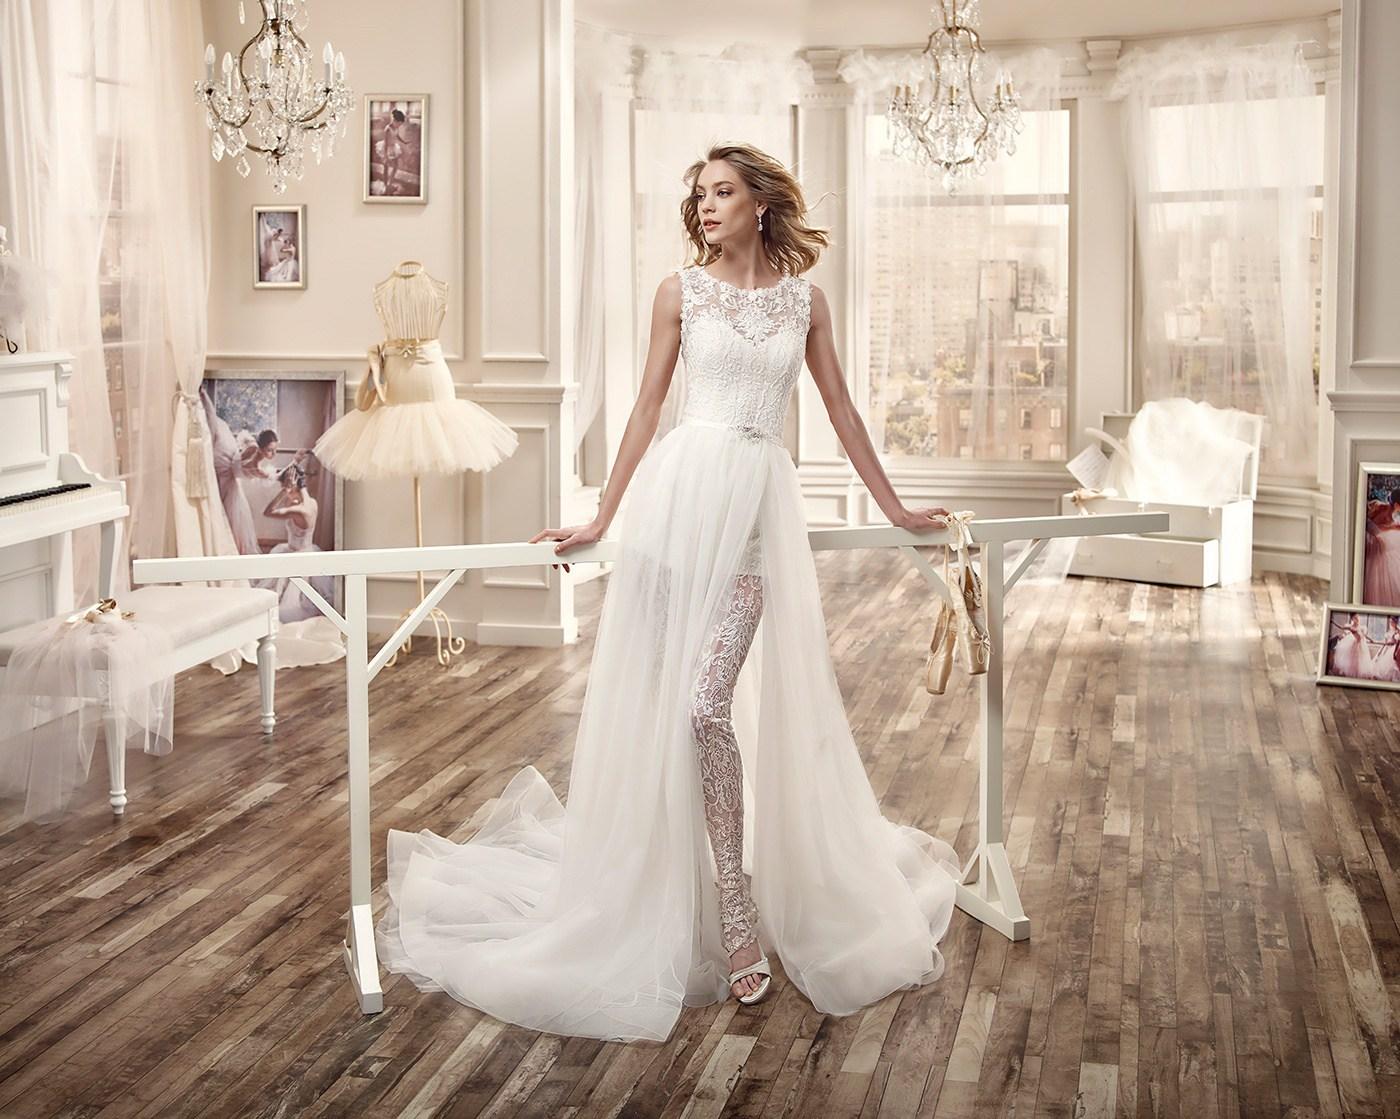 sposa pantaloni tendenza 2017 abito asimmetrico